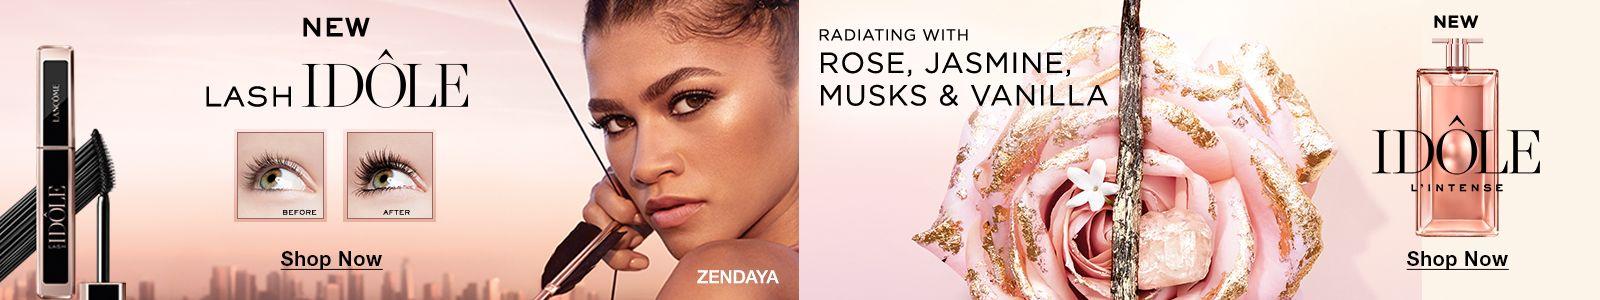 New Lash Idole, Shop Now, Radiating with, Rose, Jasmine, Musks and Vanilla, New Idole, Shop Now